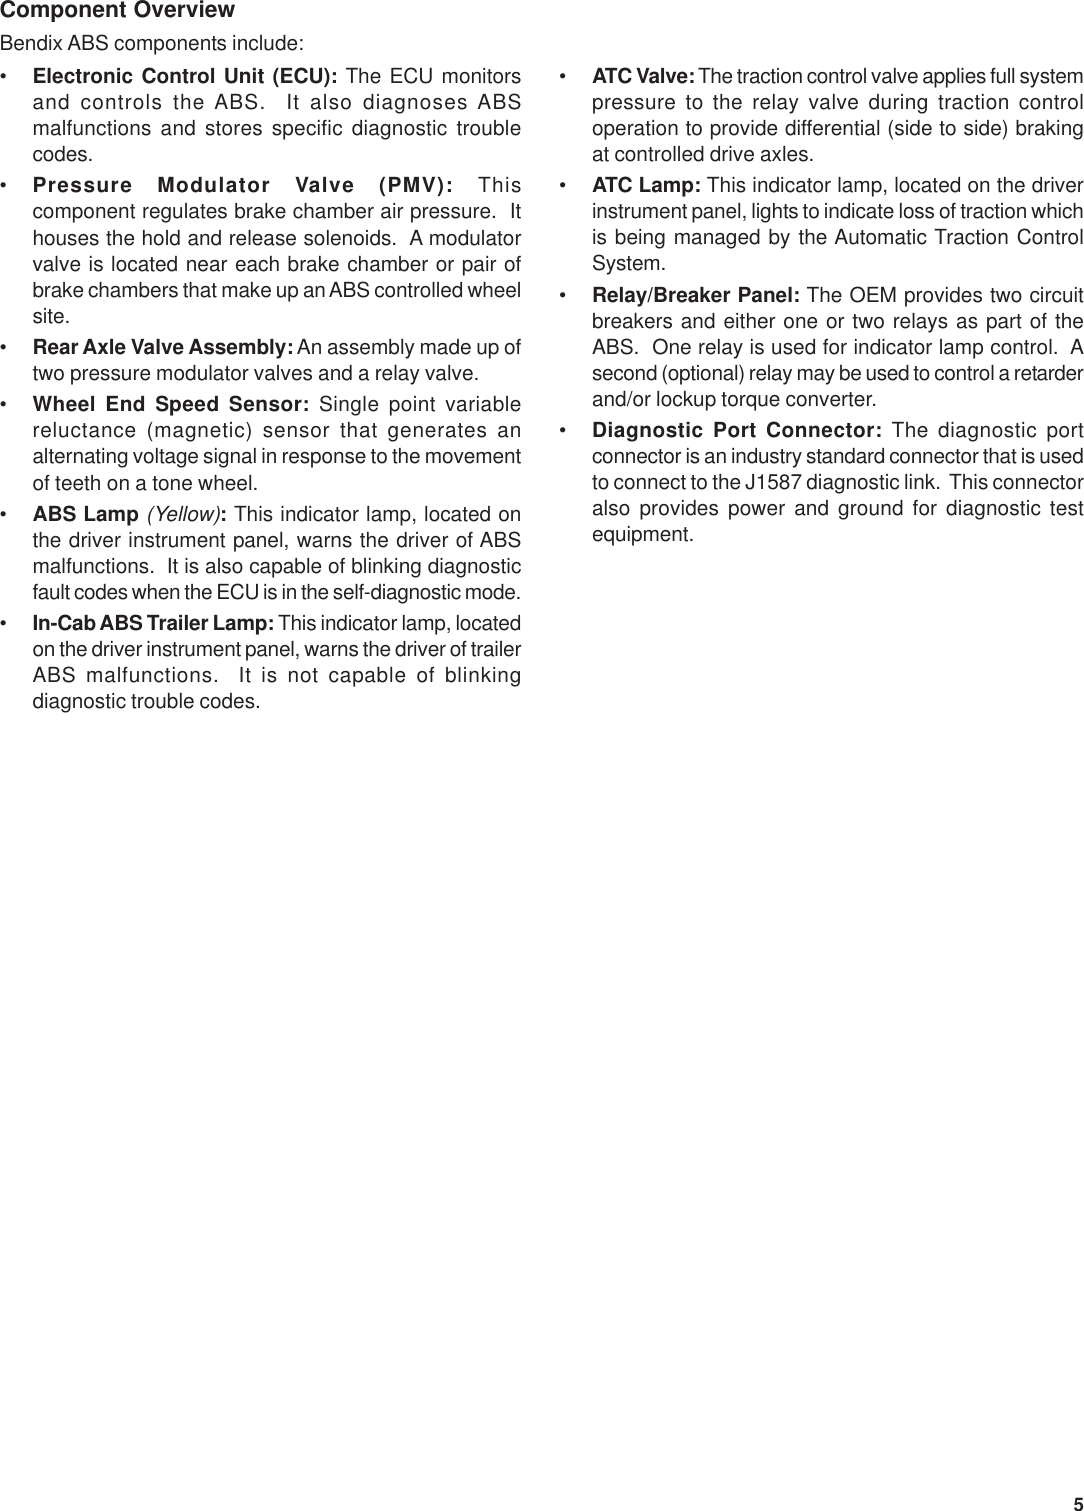 Bendix Sd 13 4746 Users Manual 4746_1_to_12e p65